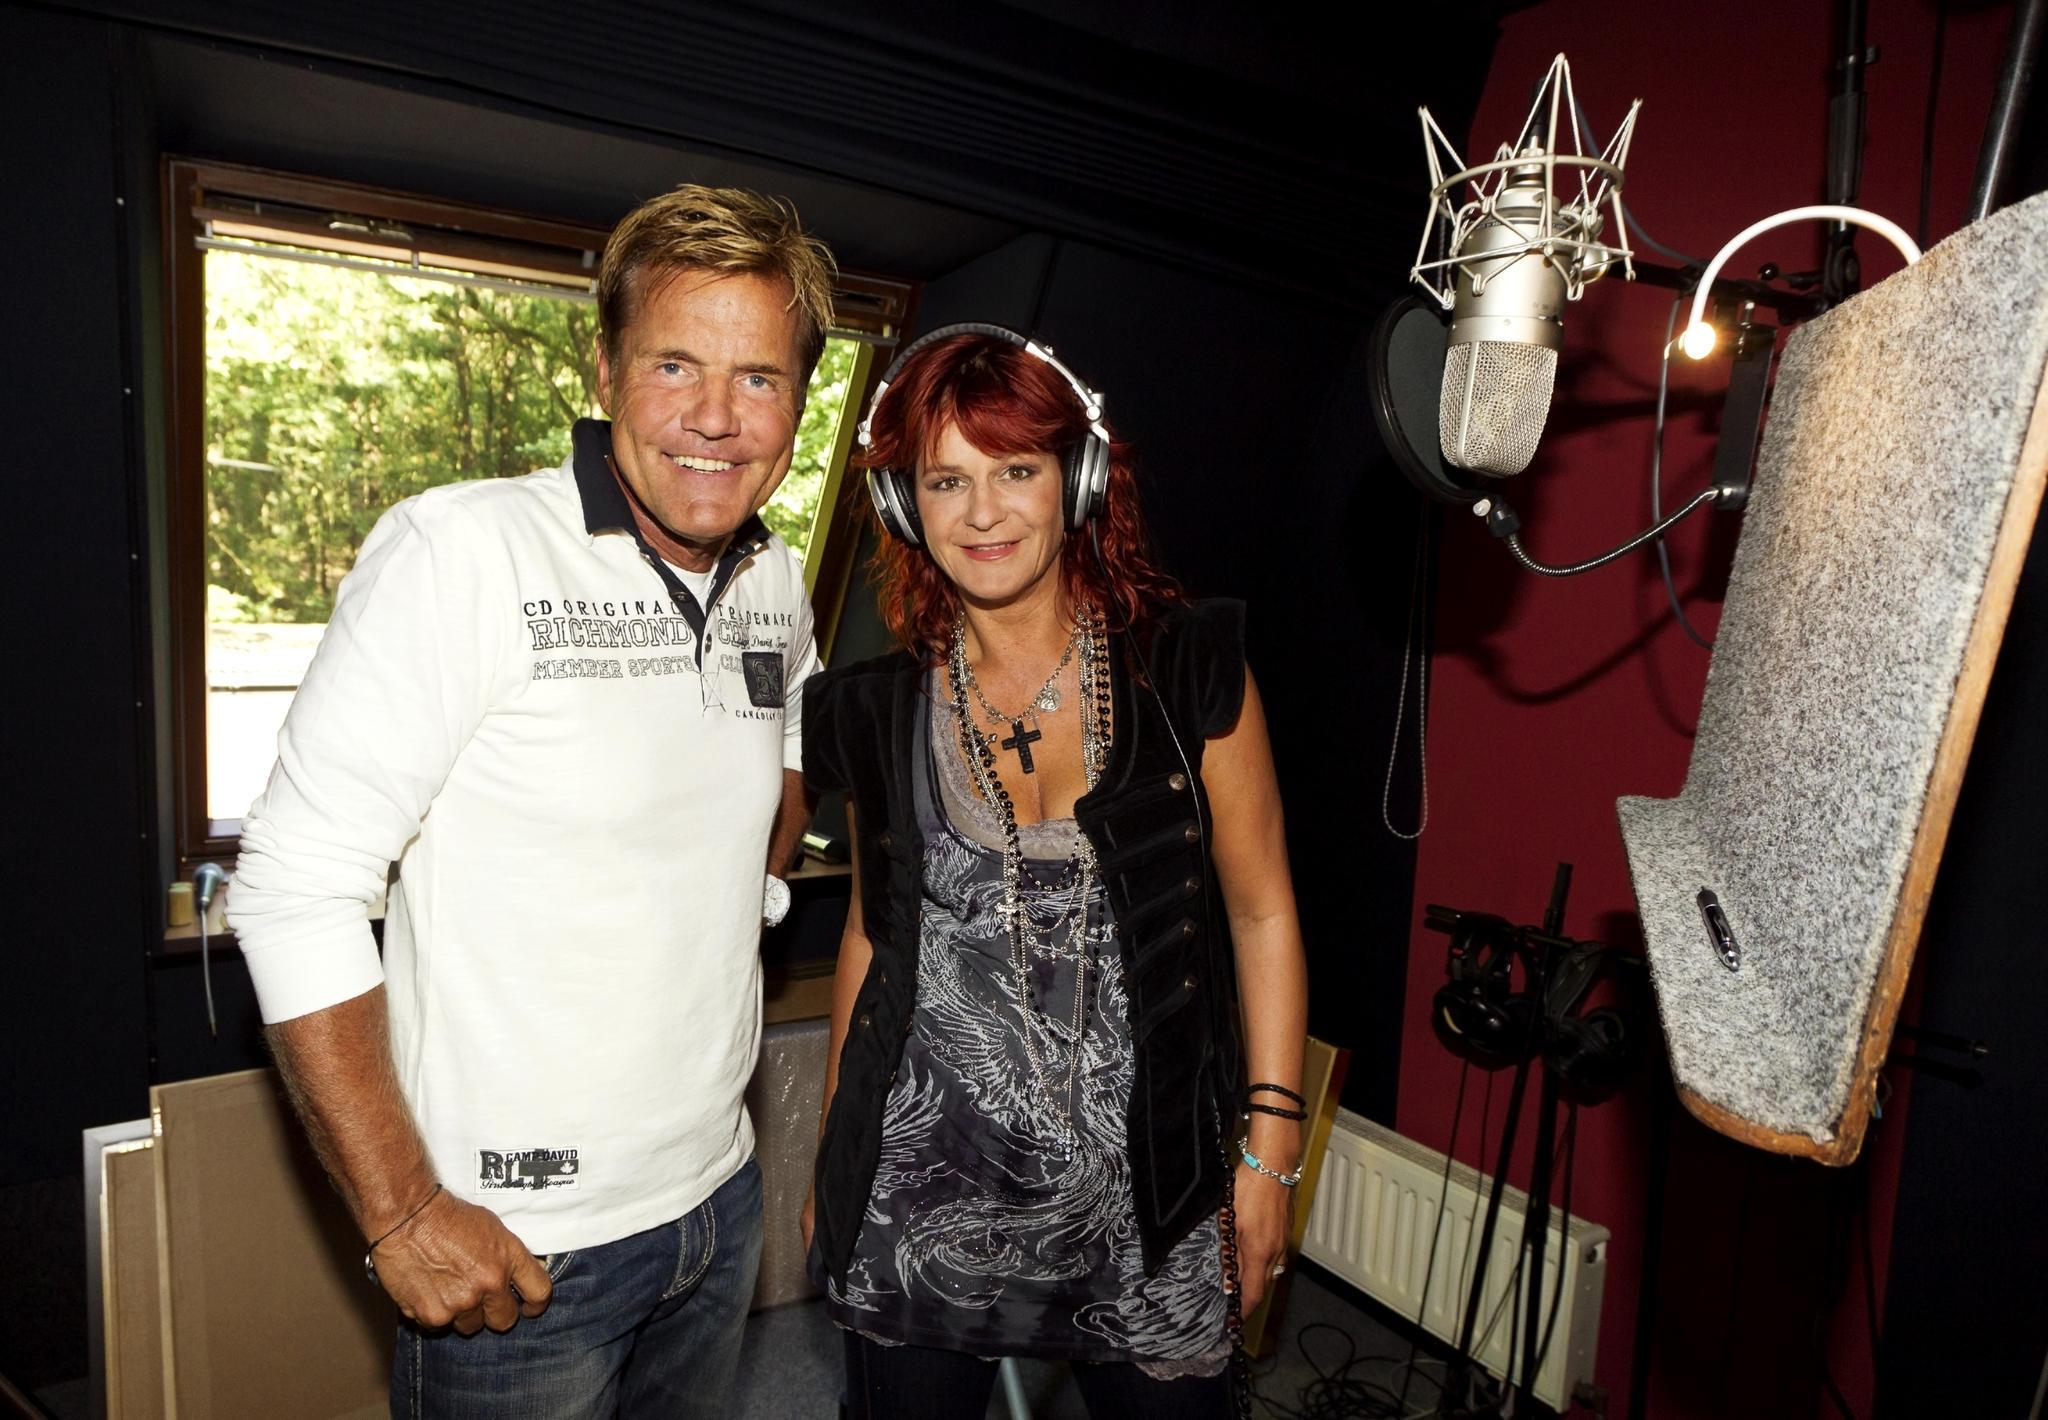 Dieter Bohlen und Andrea Berg bei Studioaufnahmen 2011